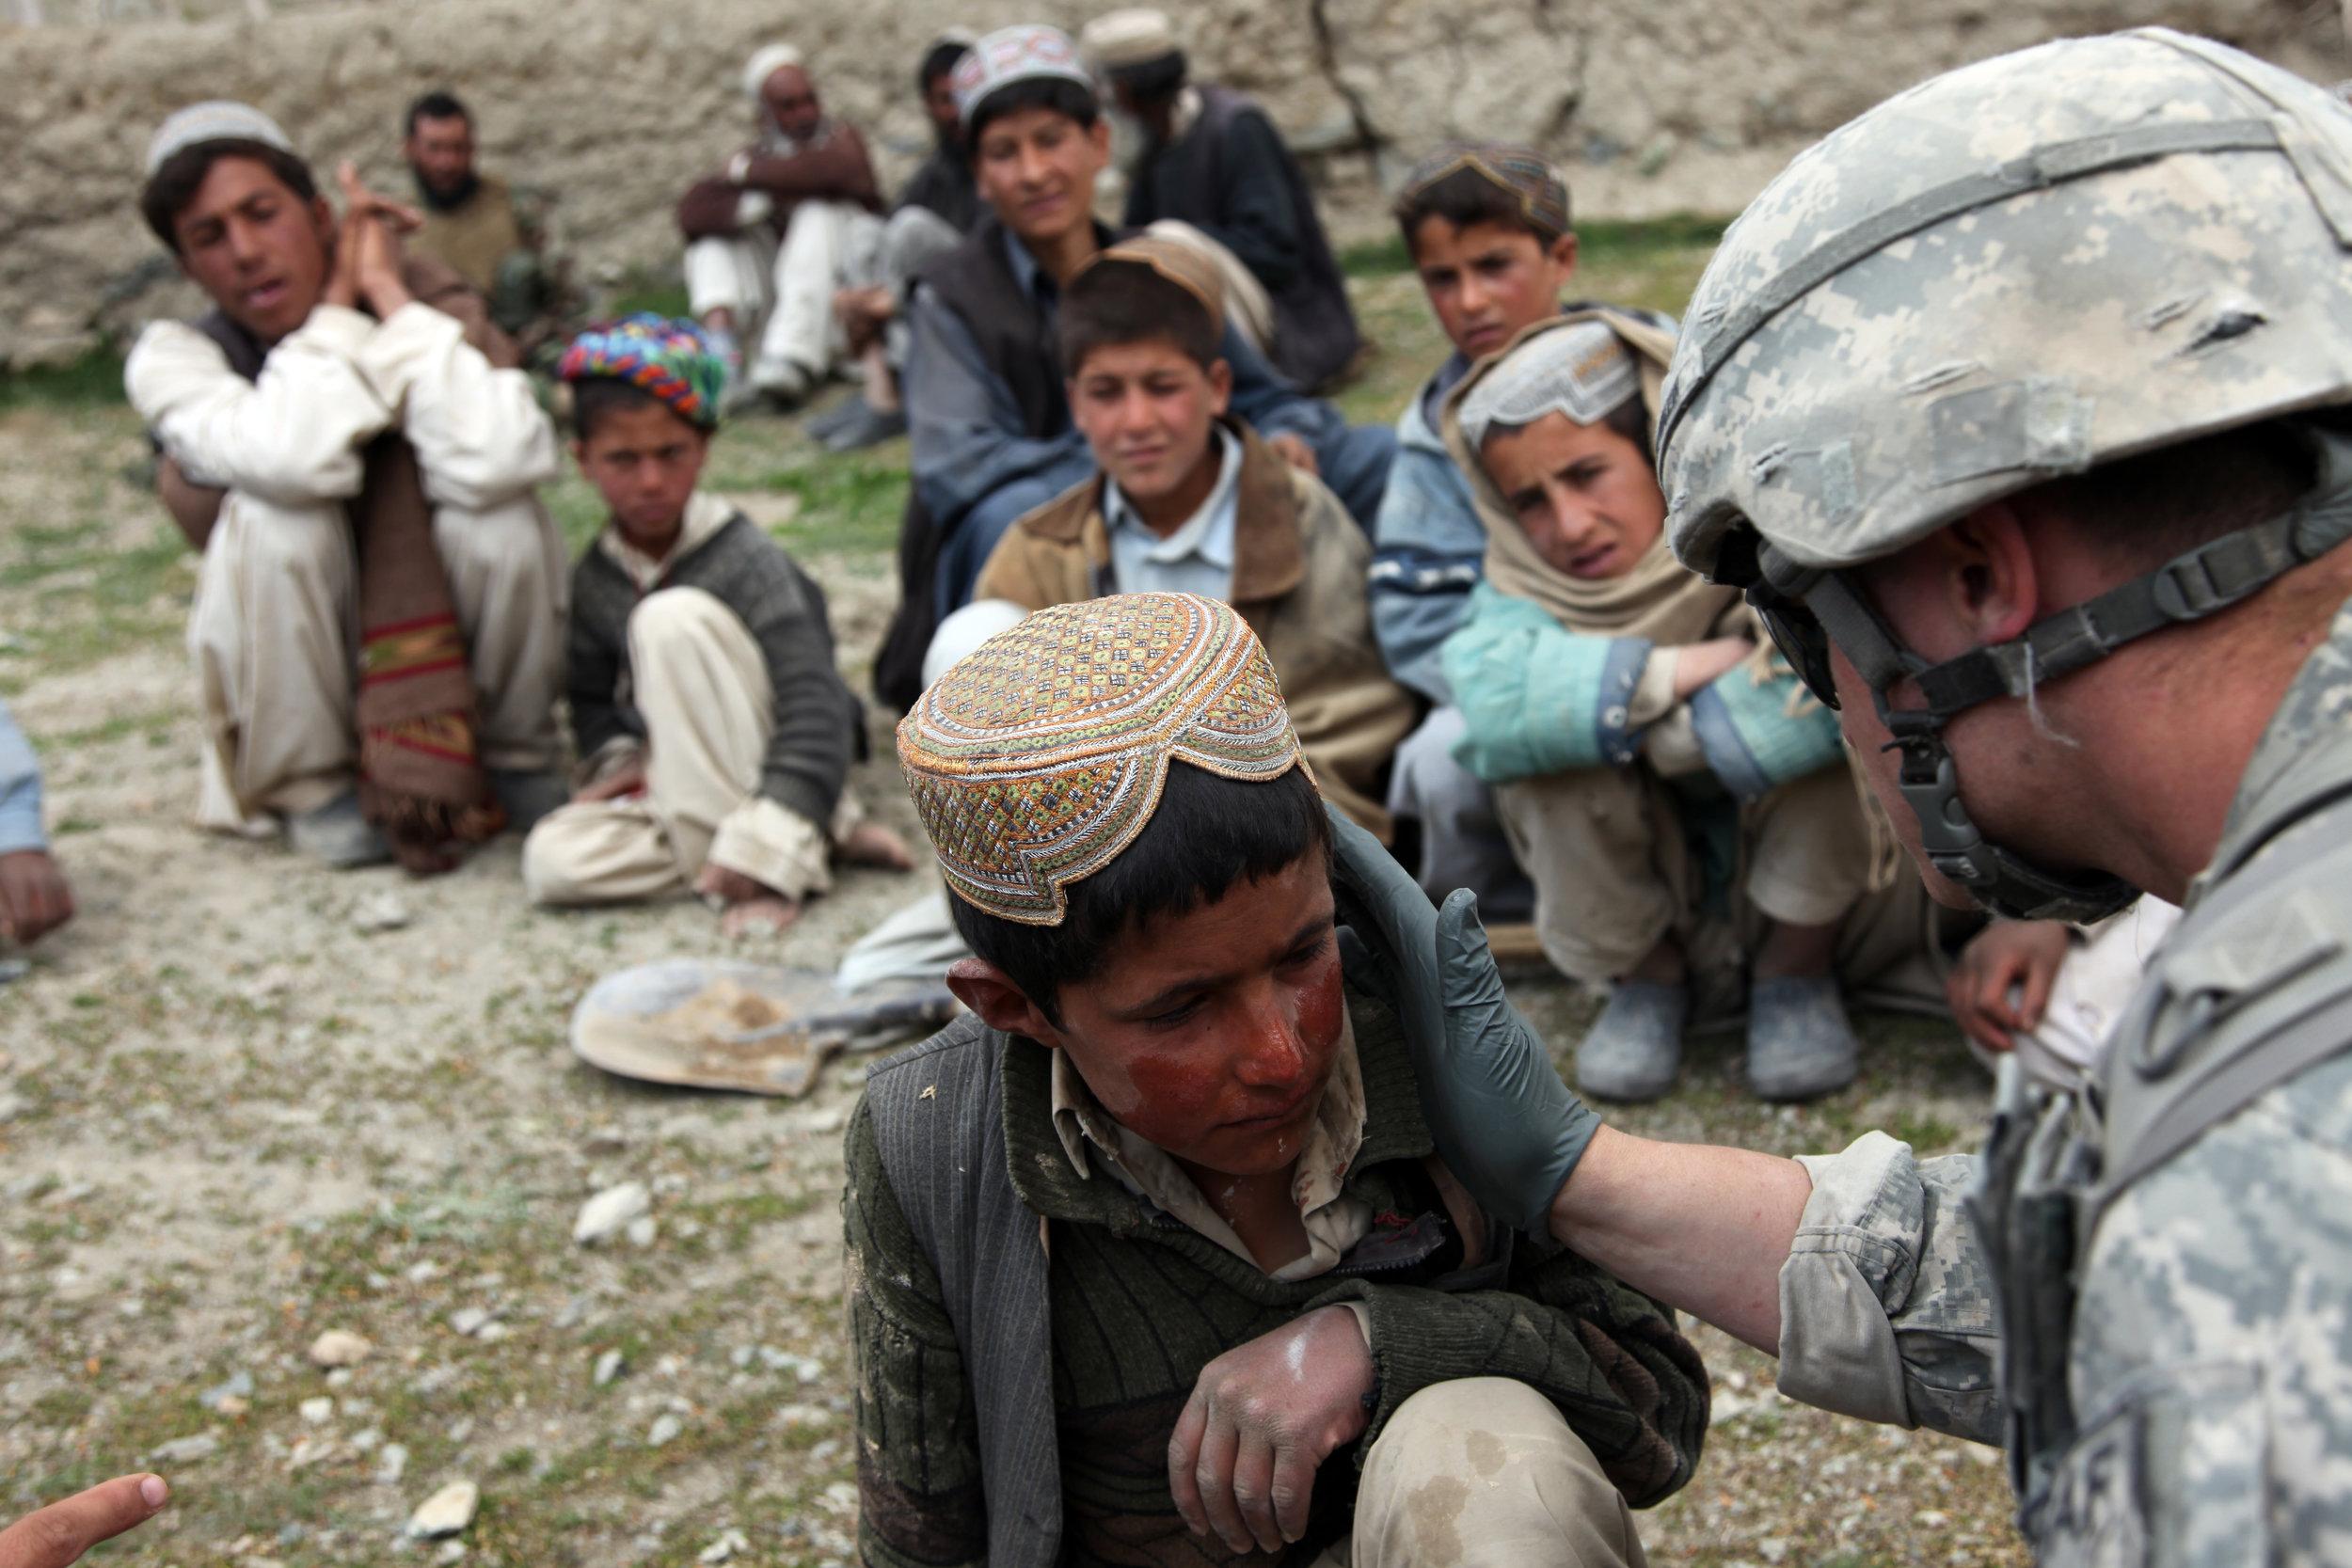 A U.S. Army medic treats an Afghan child for a sunburn in the village of Meryanay Kherwar District, Logar province, Afghanistan, April 9. (ISAF Public Affairs Photo/Wikimeida)